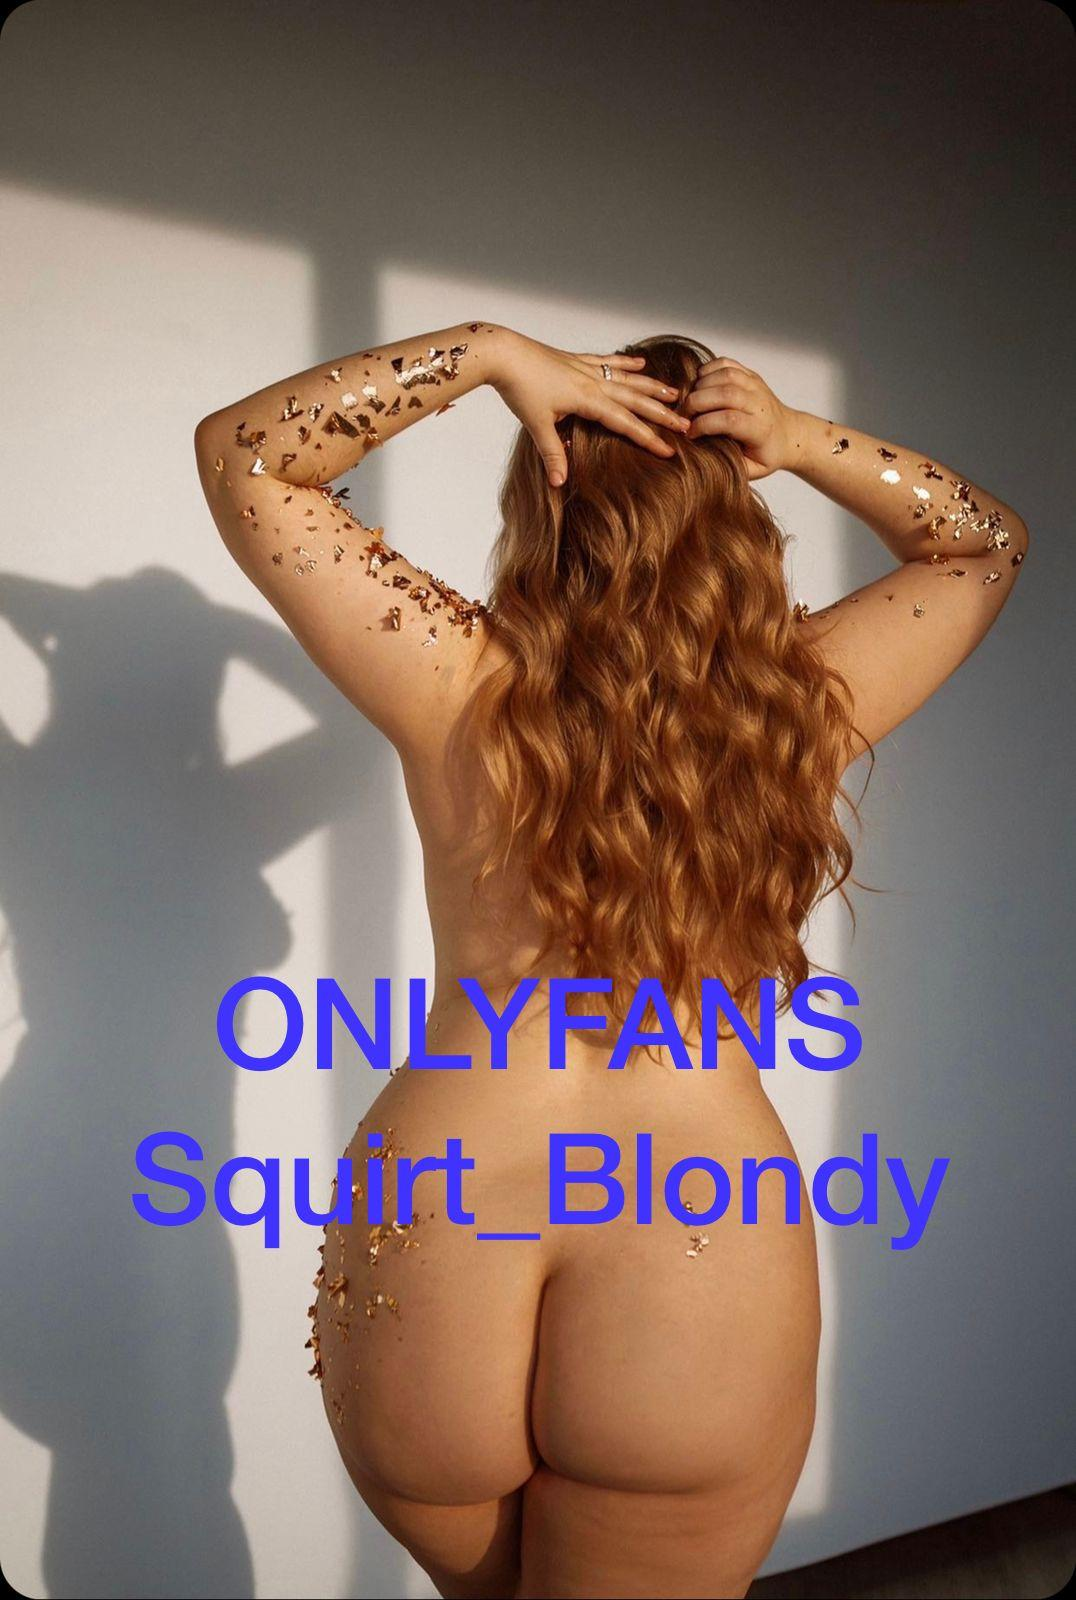 Squirt blondy?s=zdyumb8mhpeoathg0lrfmncpy3joeh30ajktl4jas4a=